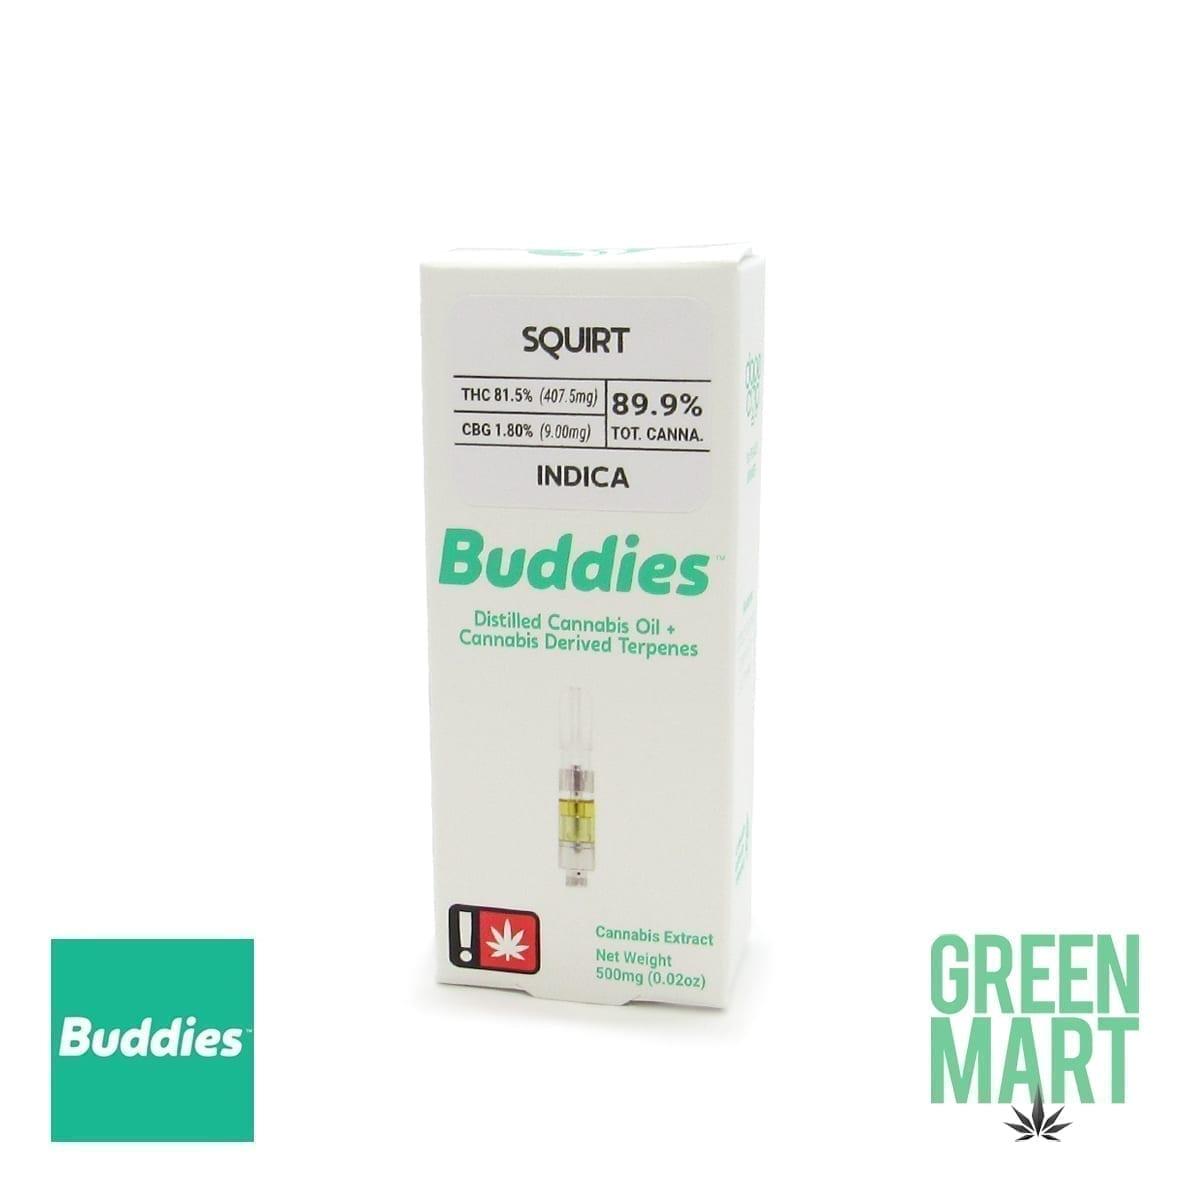 Buddies Brand Distillate Cartridge - SQUIRT